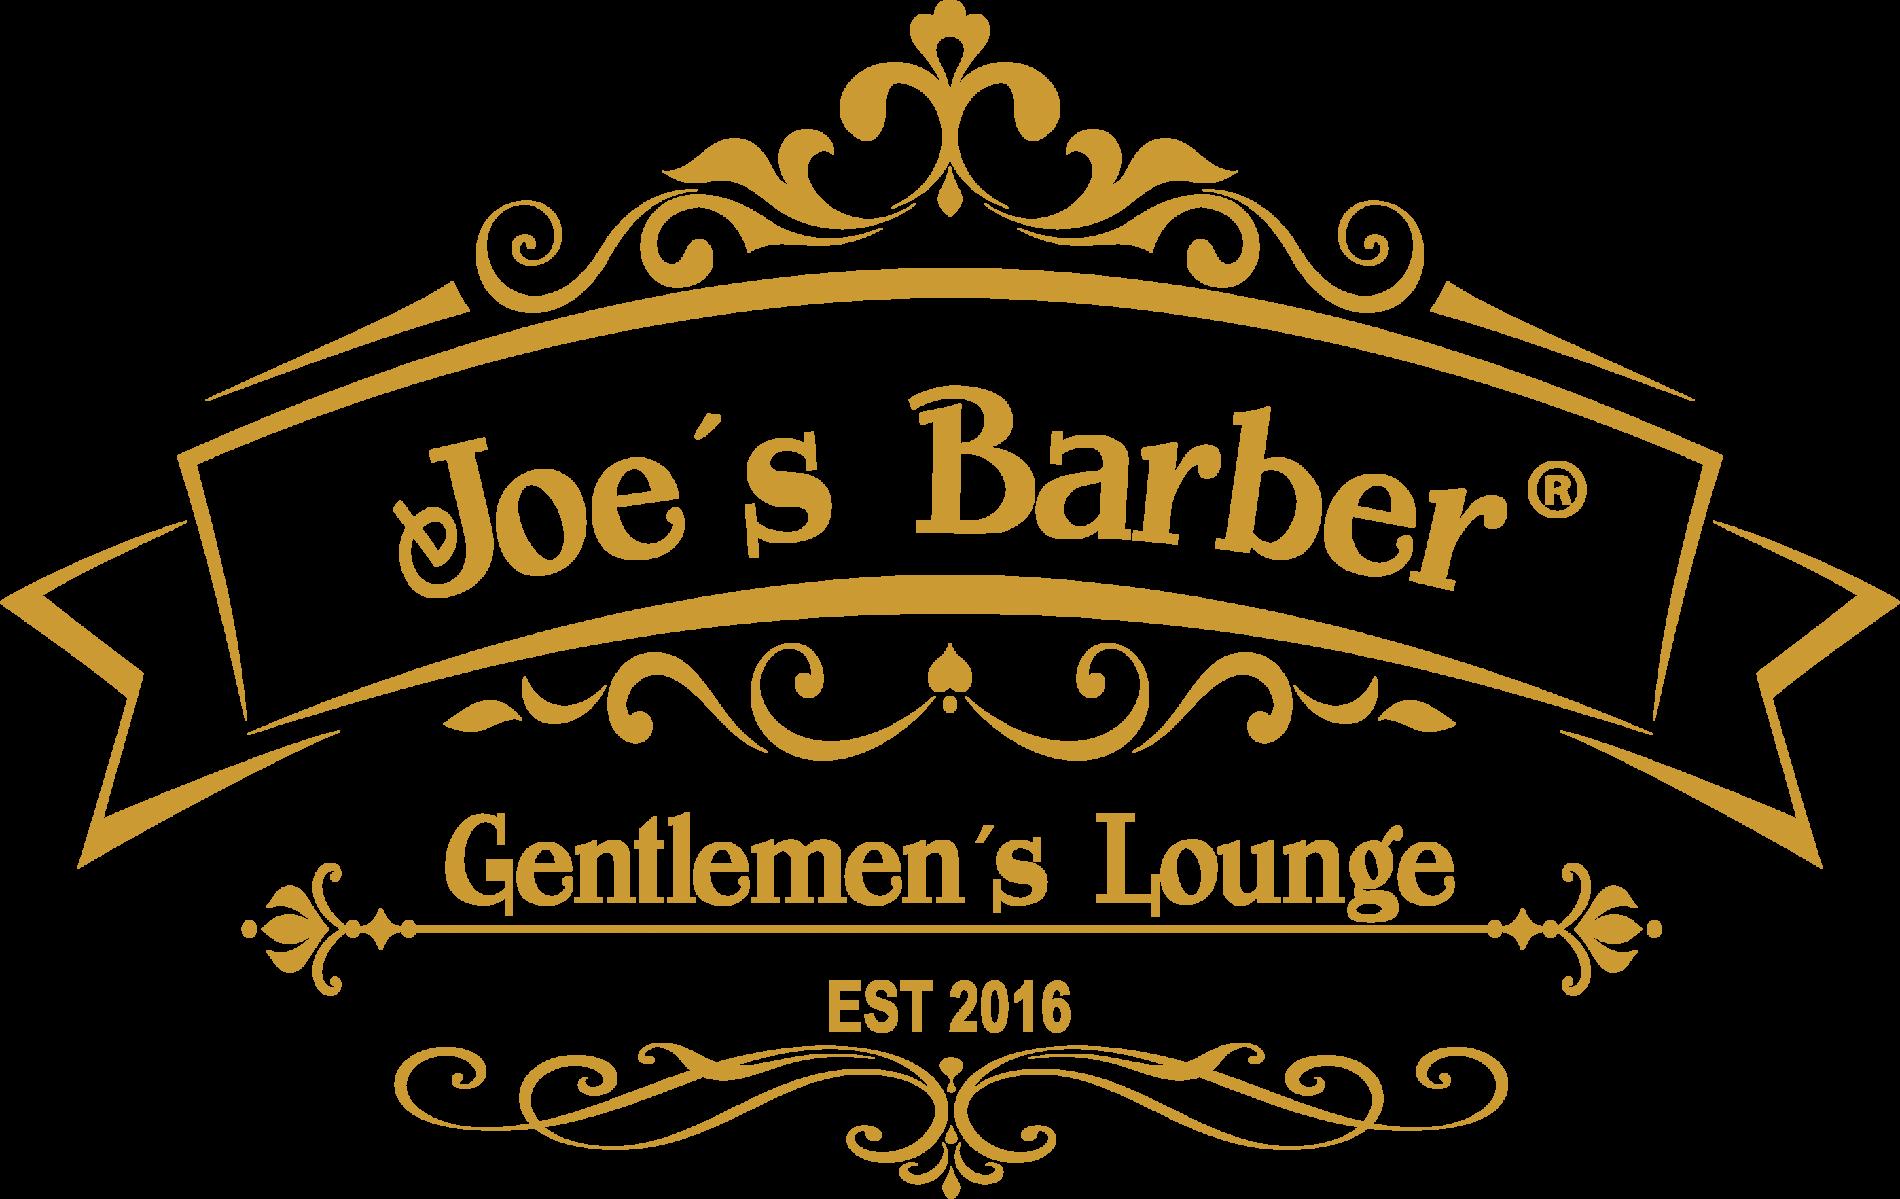 Joe's Barber - Barbier in Wolfsburg